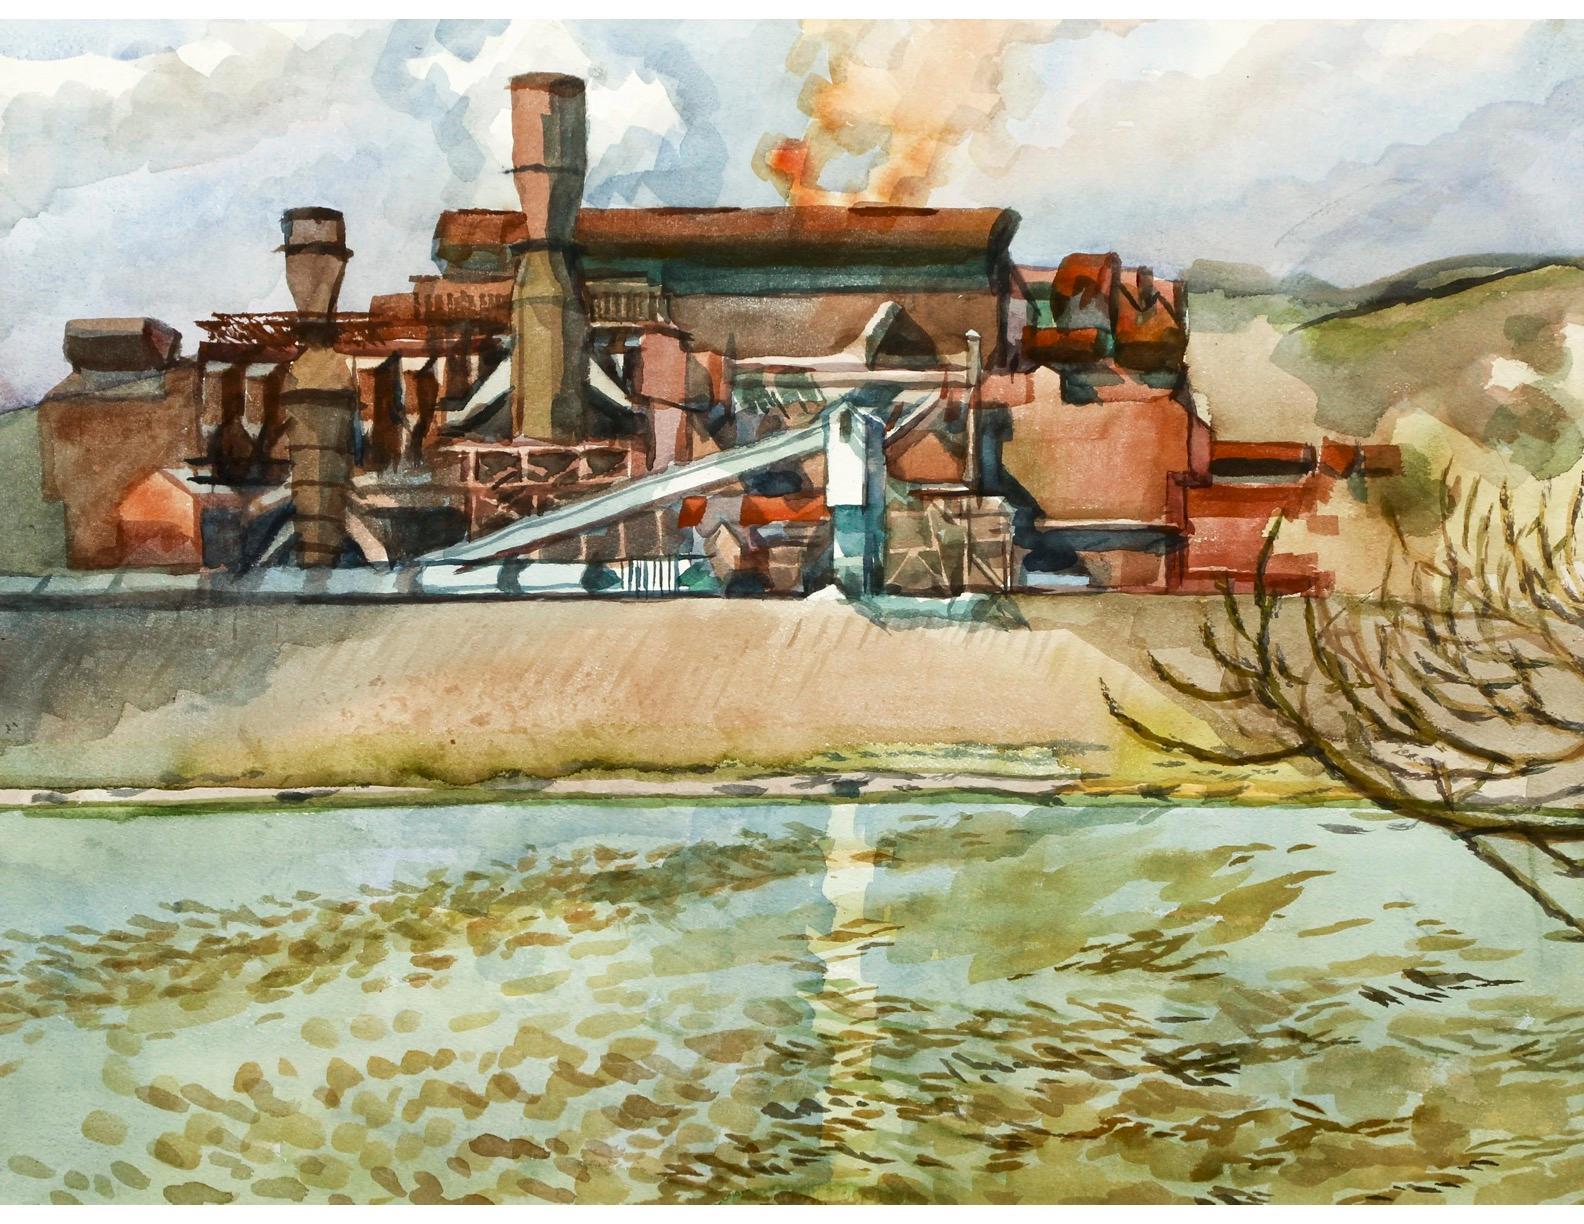 """J&L Oxygen Plant"" Industrial Landscape  Scene Contemporary Watercolor Drawing"